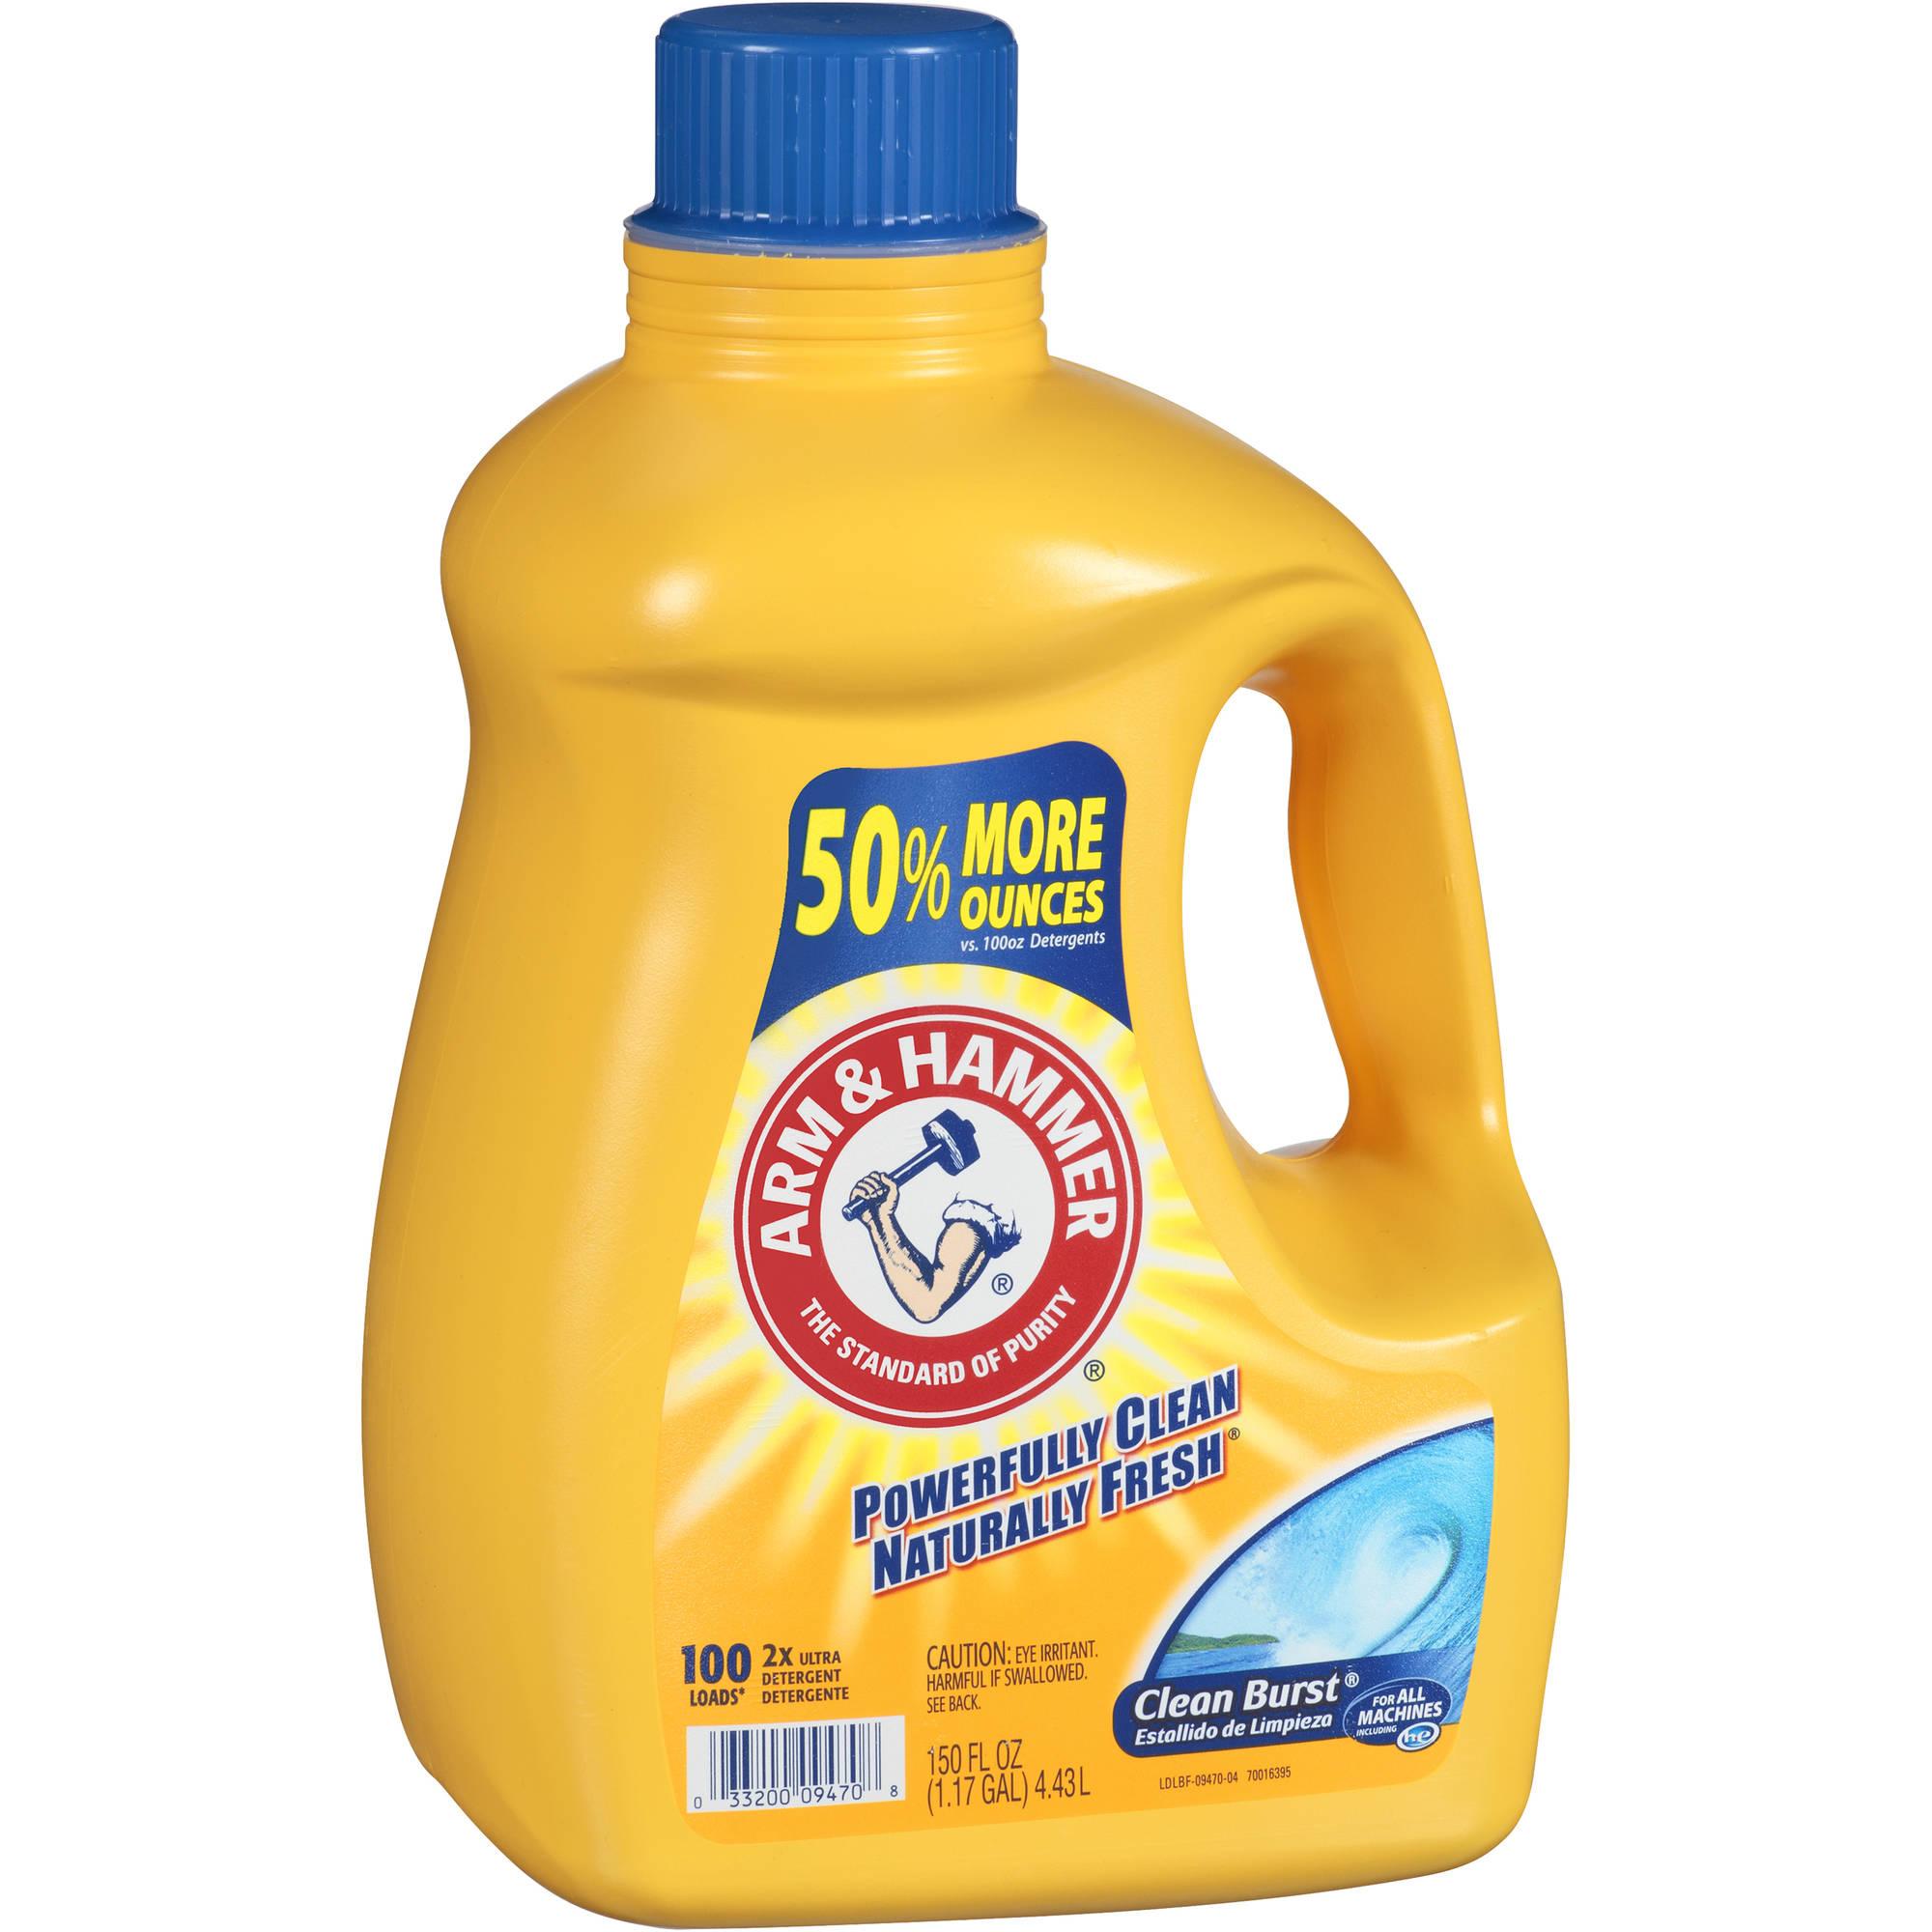 Arm & Hammer 2x Concentrated Liquid Laundry Detergent, Clean Burst , 150 oz